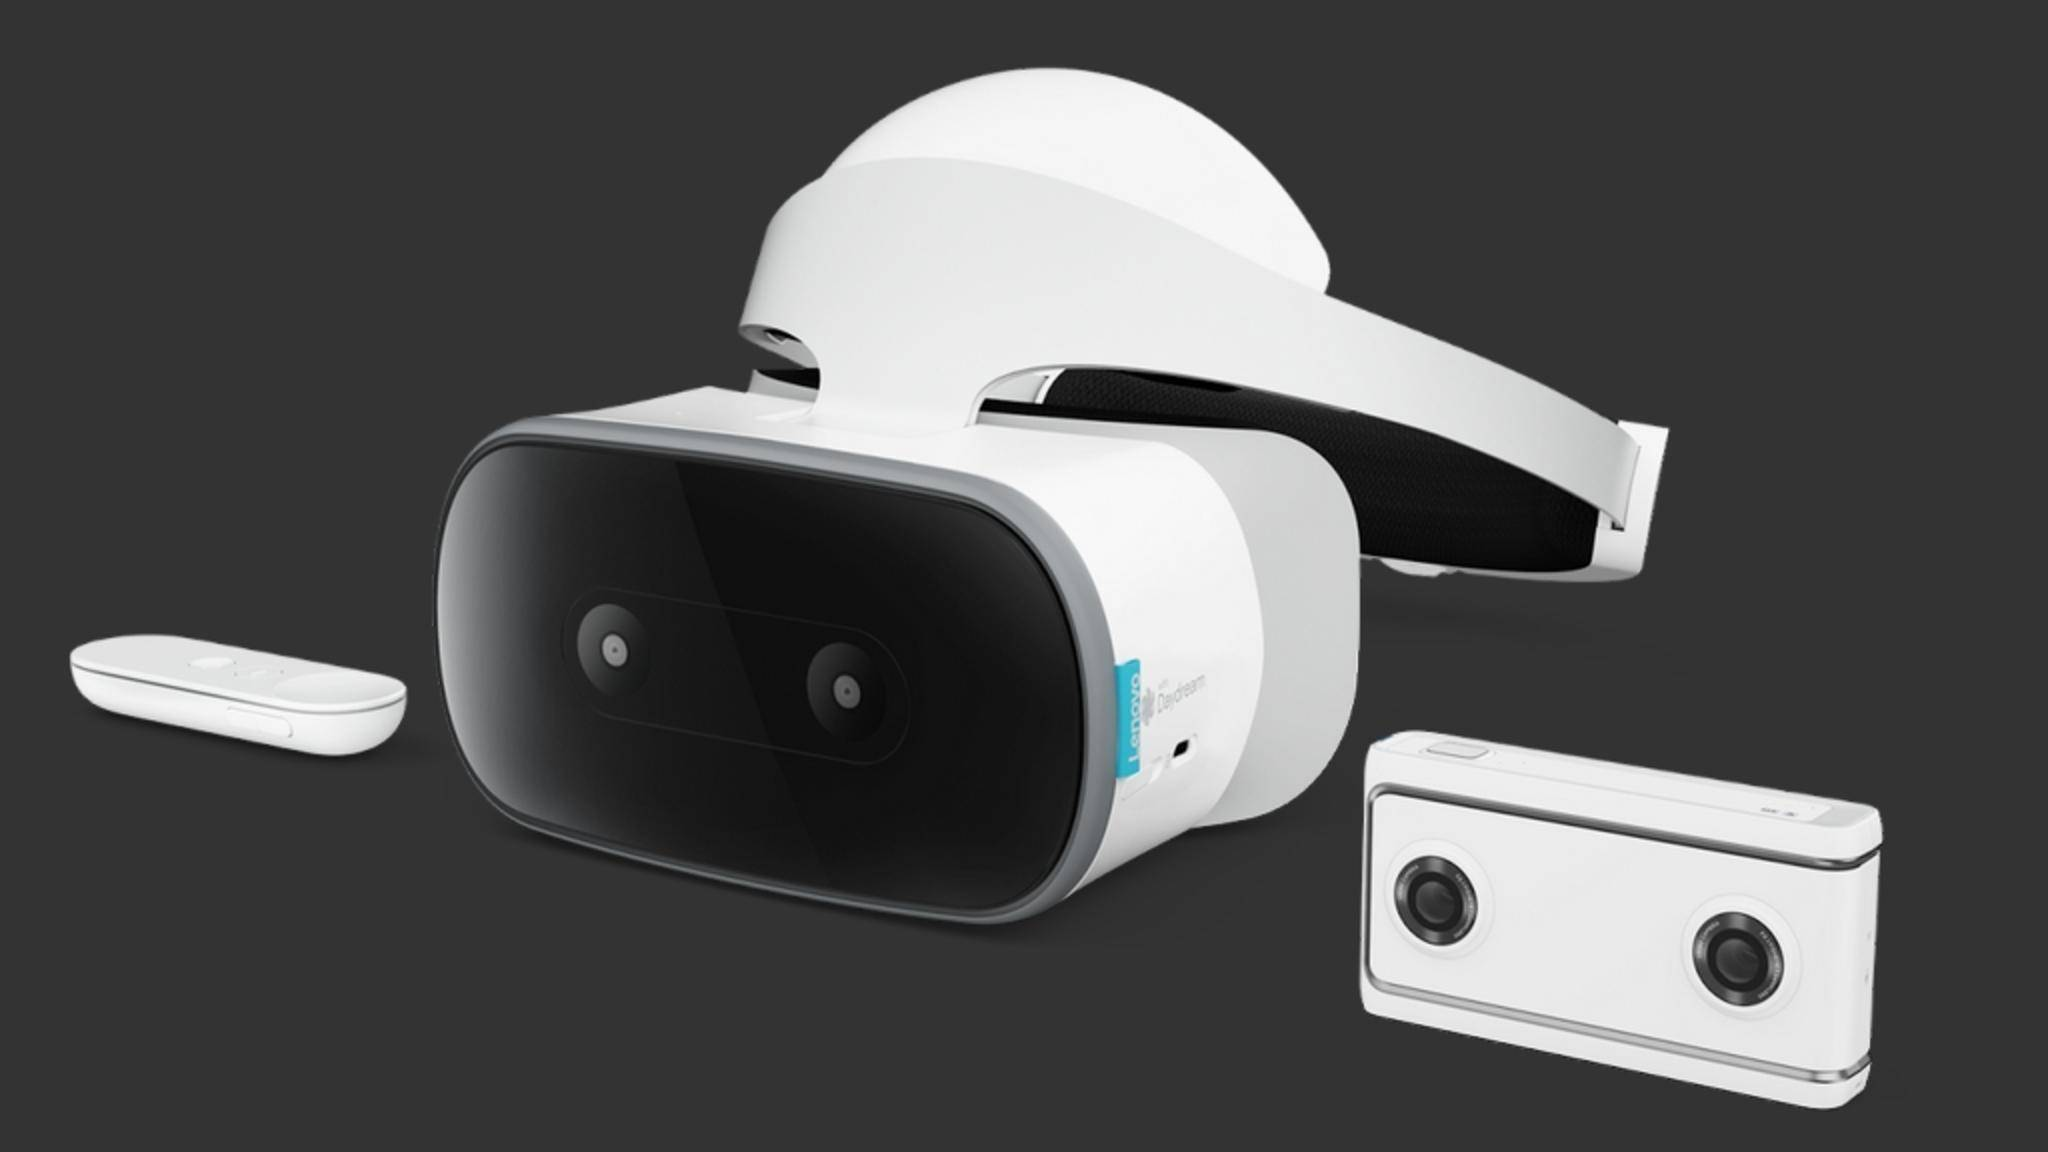 Die VR-Brille Lenovo Mirage bietet kabelloses Raumtracking.